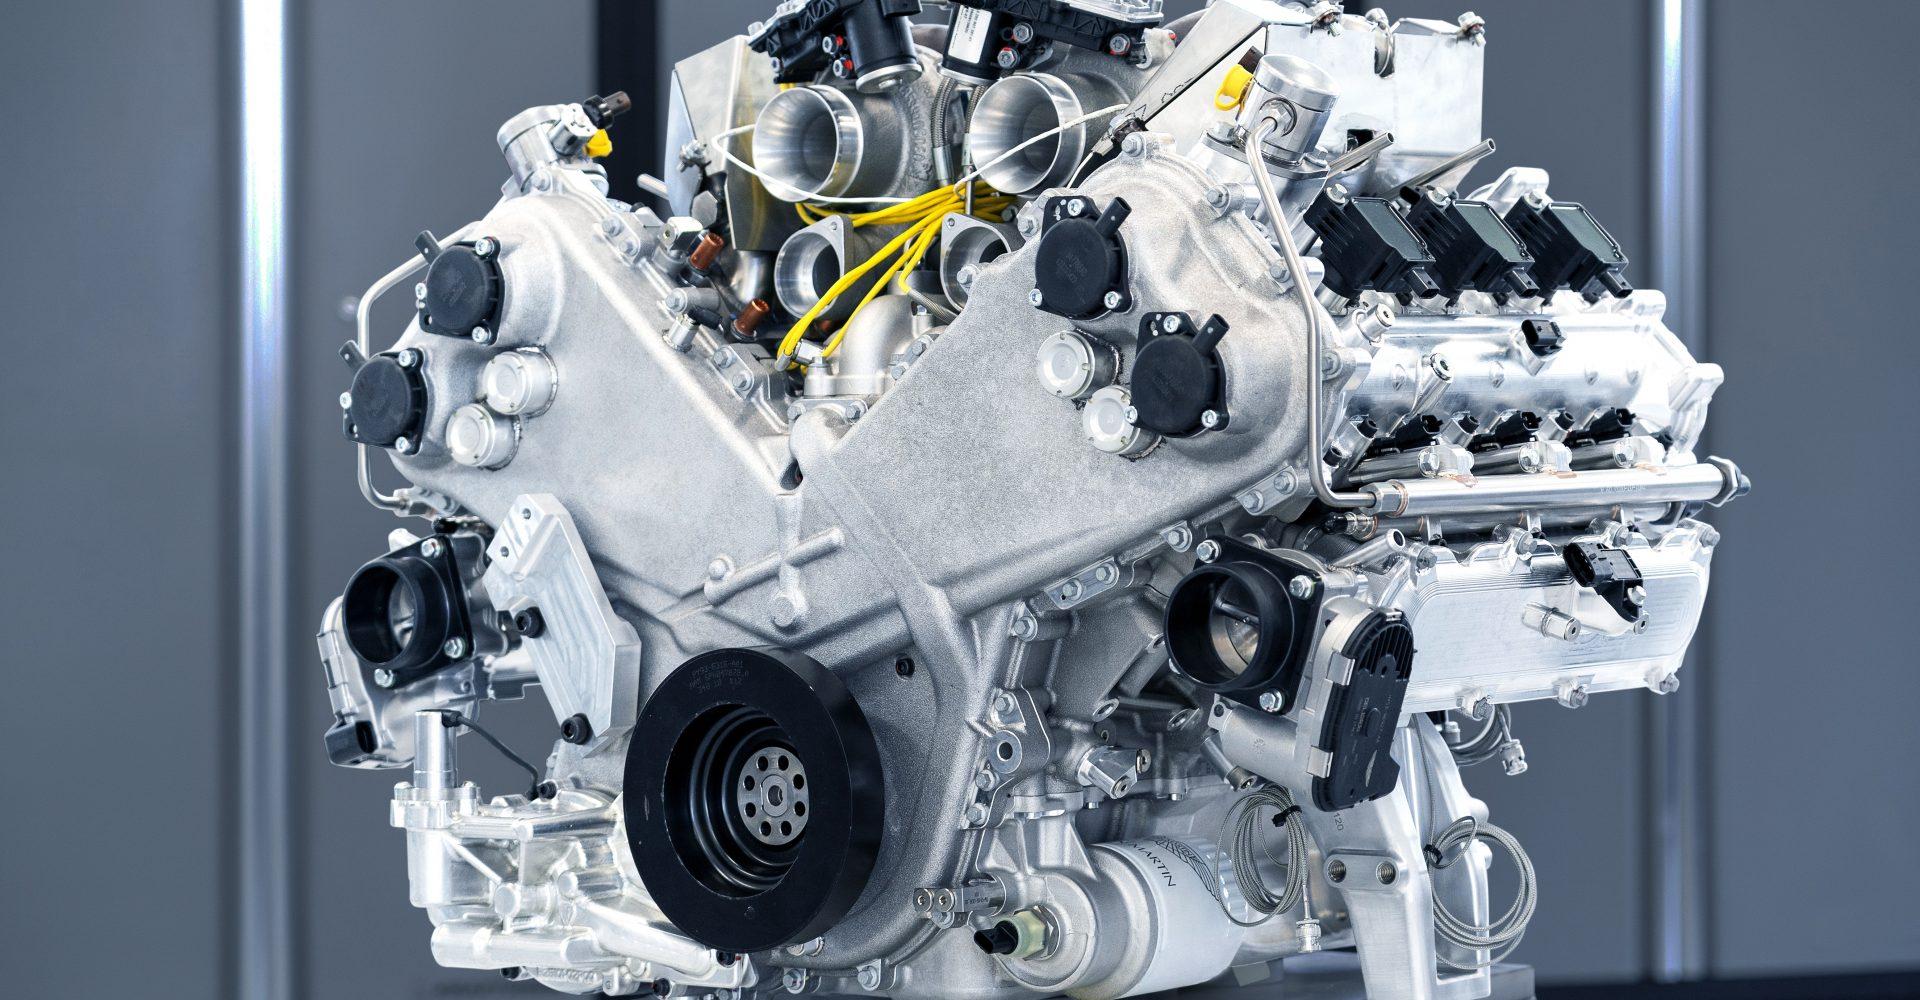 Aston Martin reveals details of all-new V6 engine